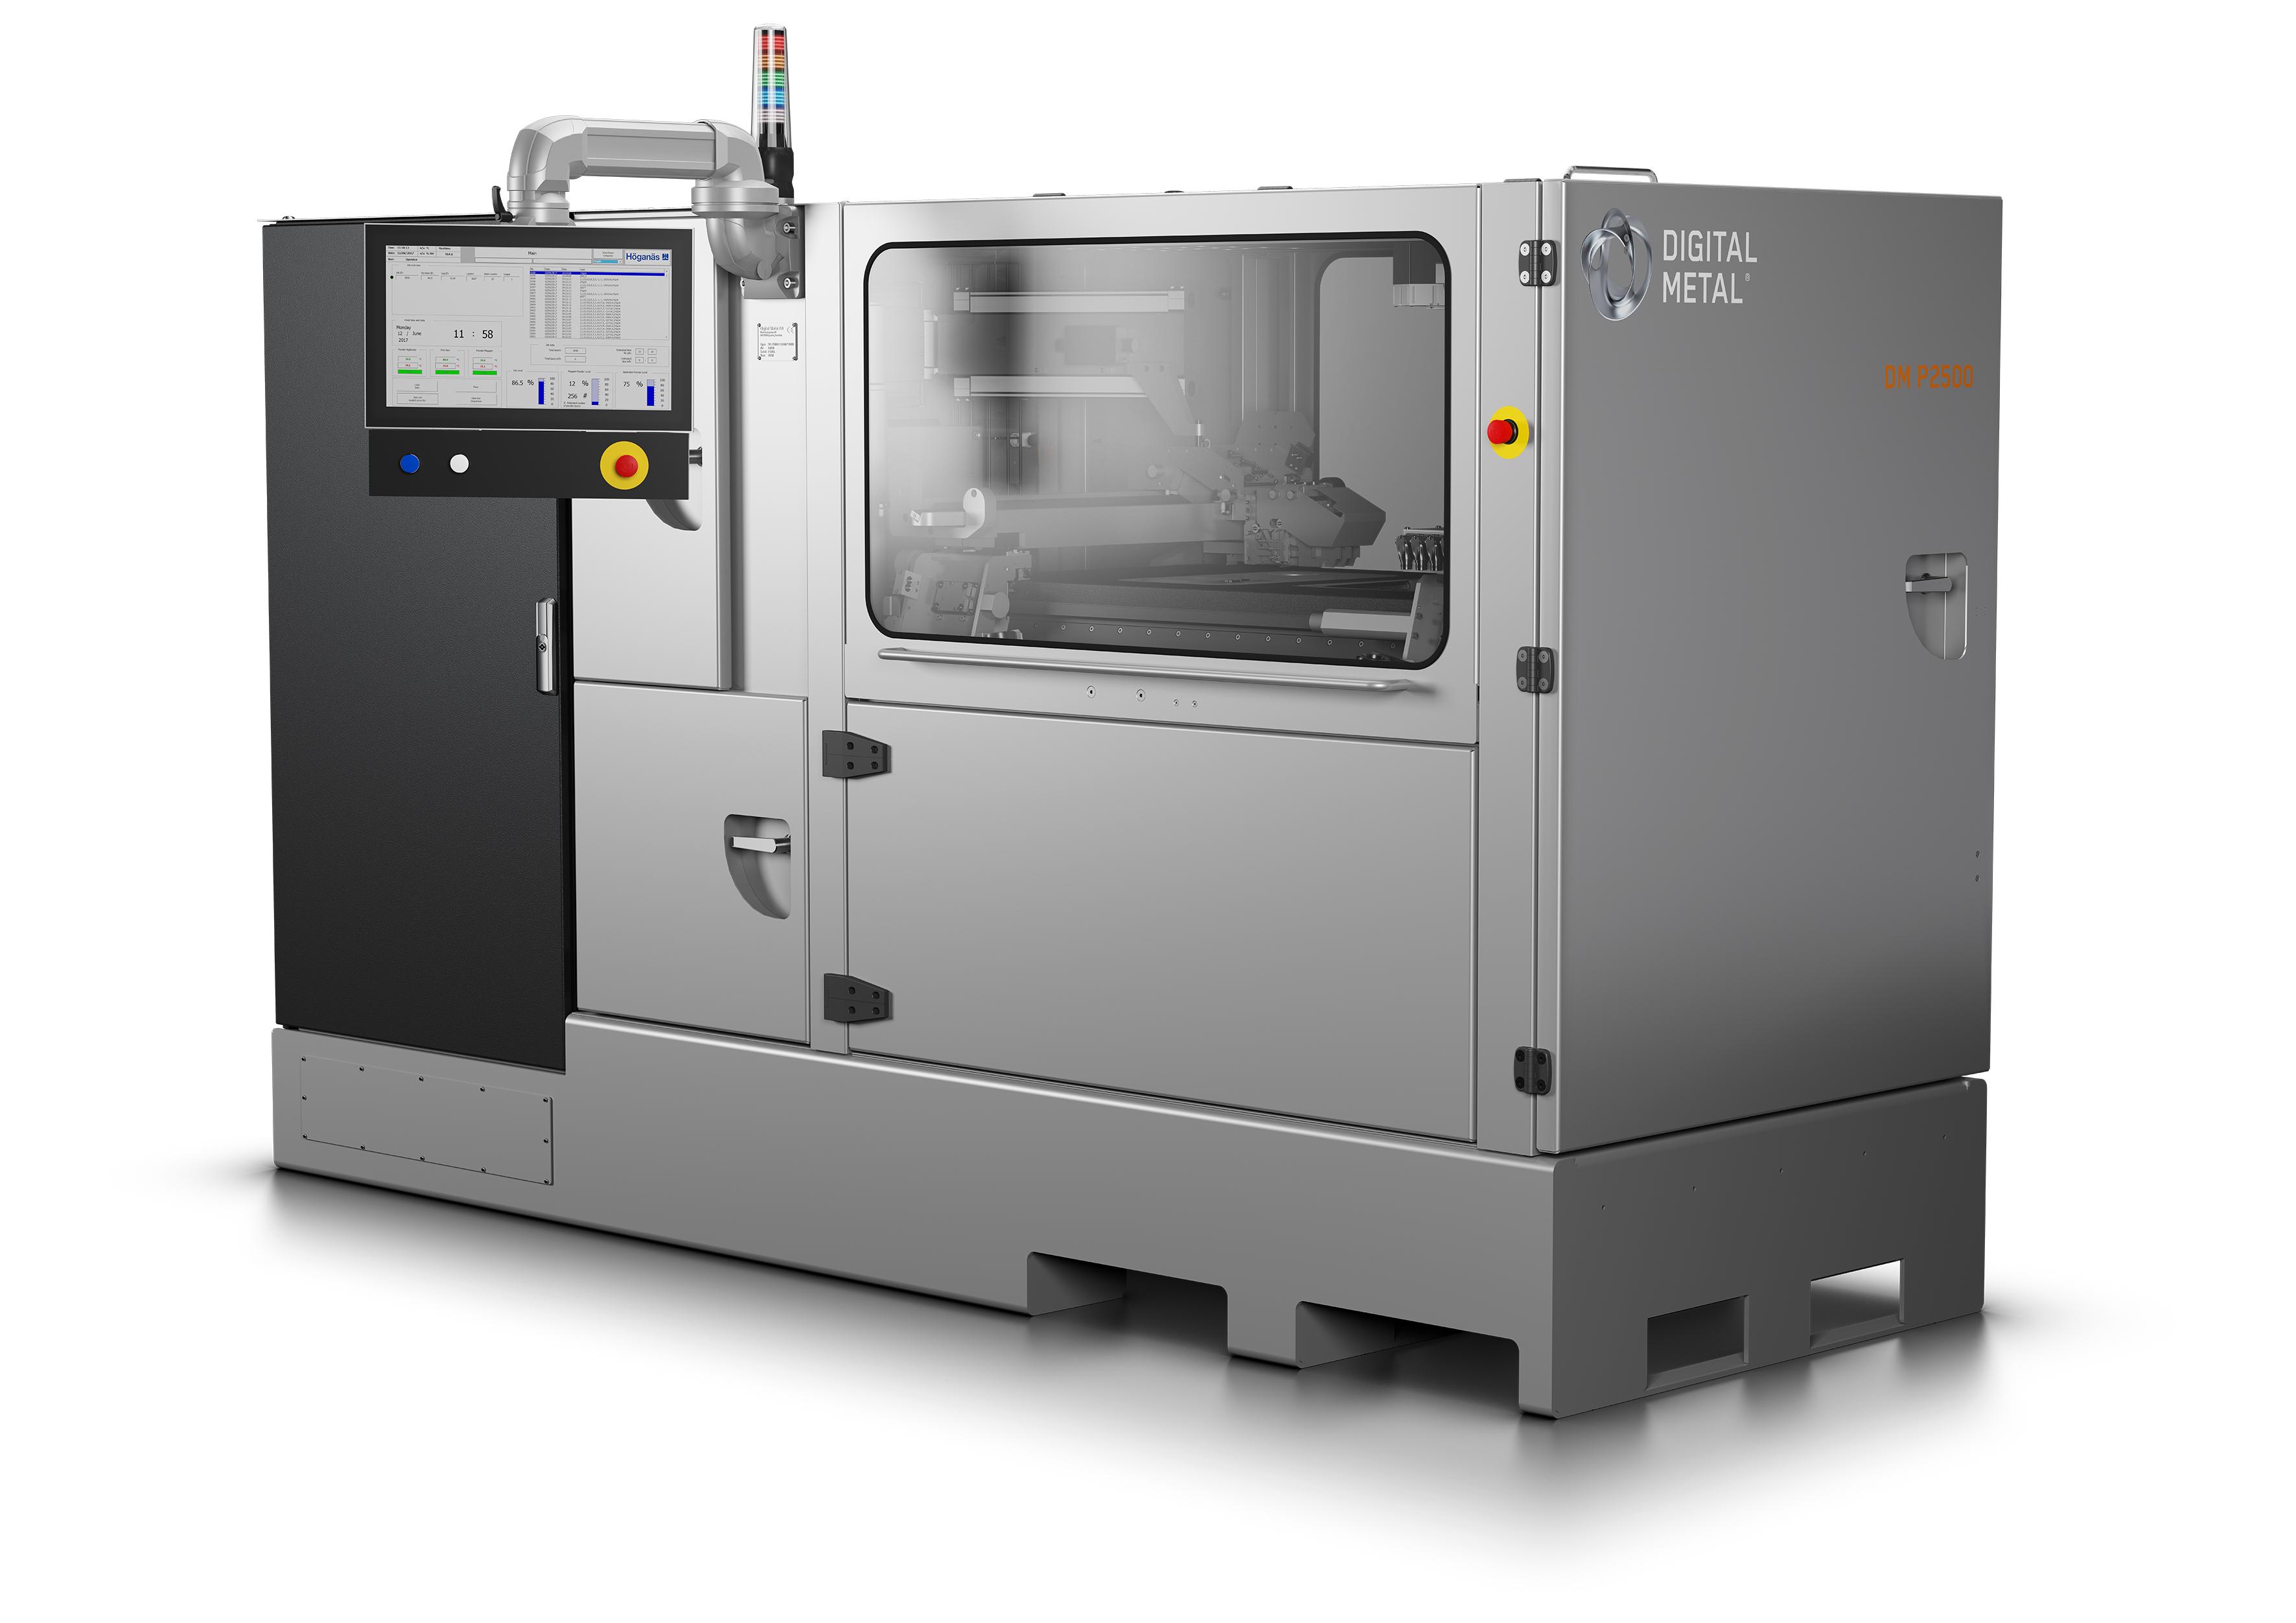 The DM P2500 3D printer. Photo via Digital Metal.